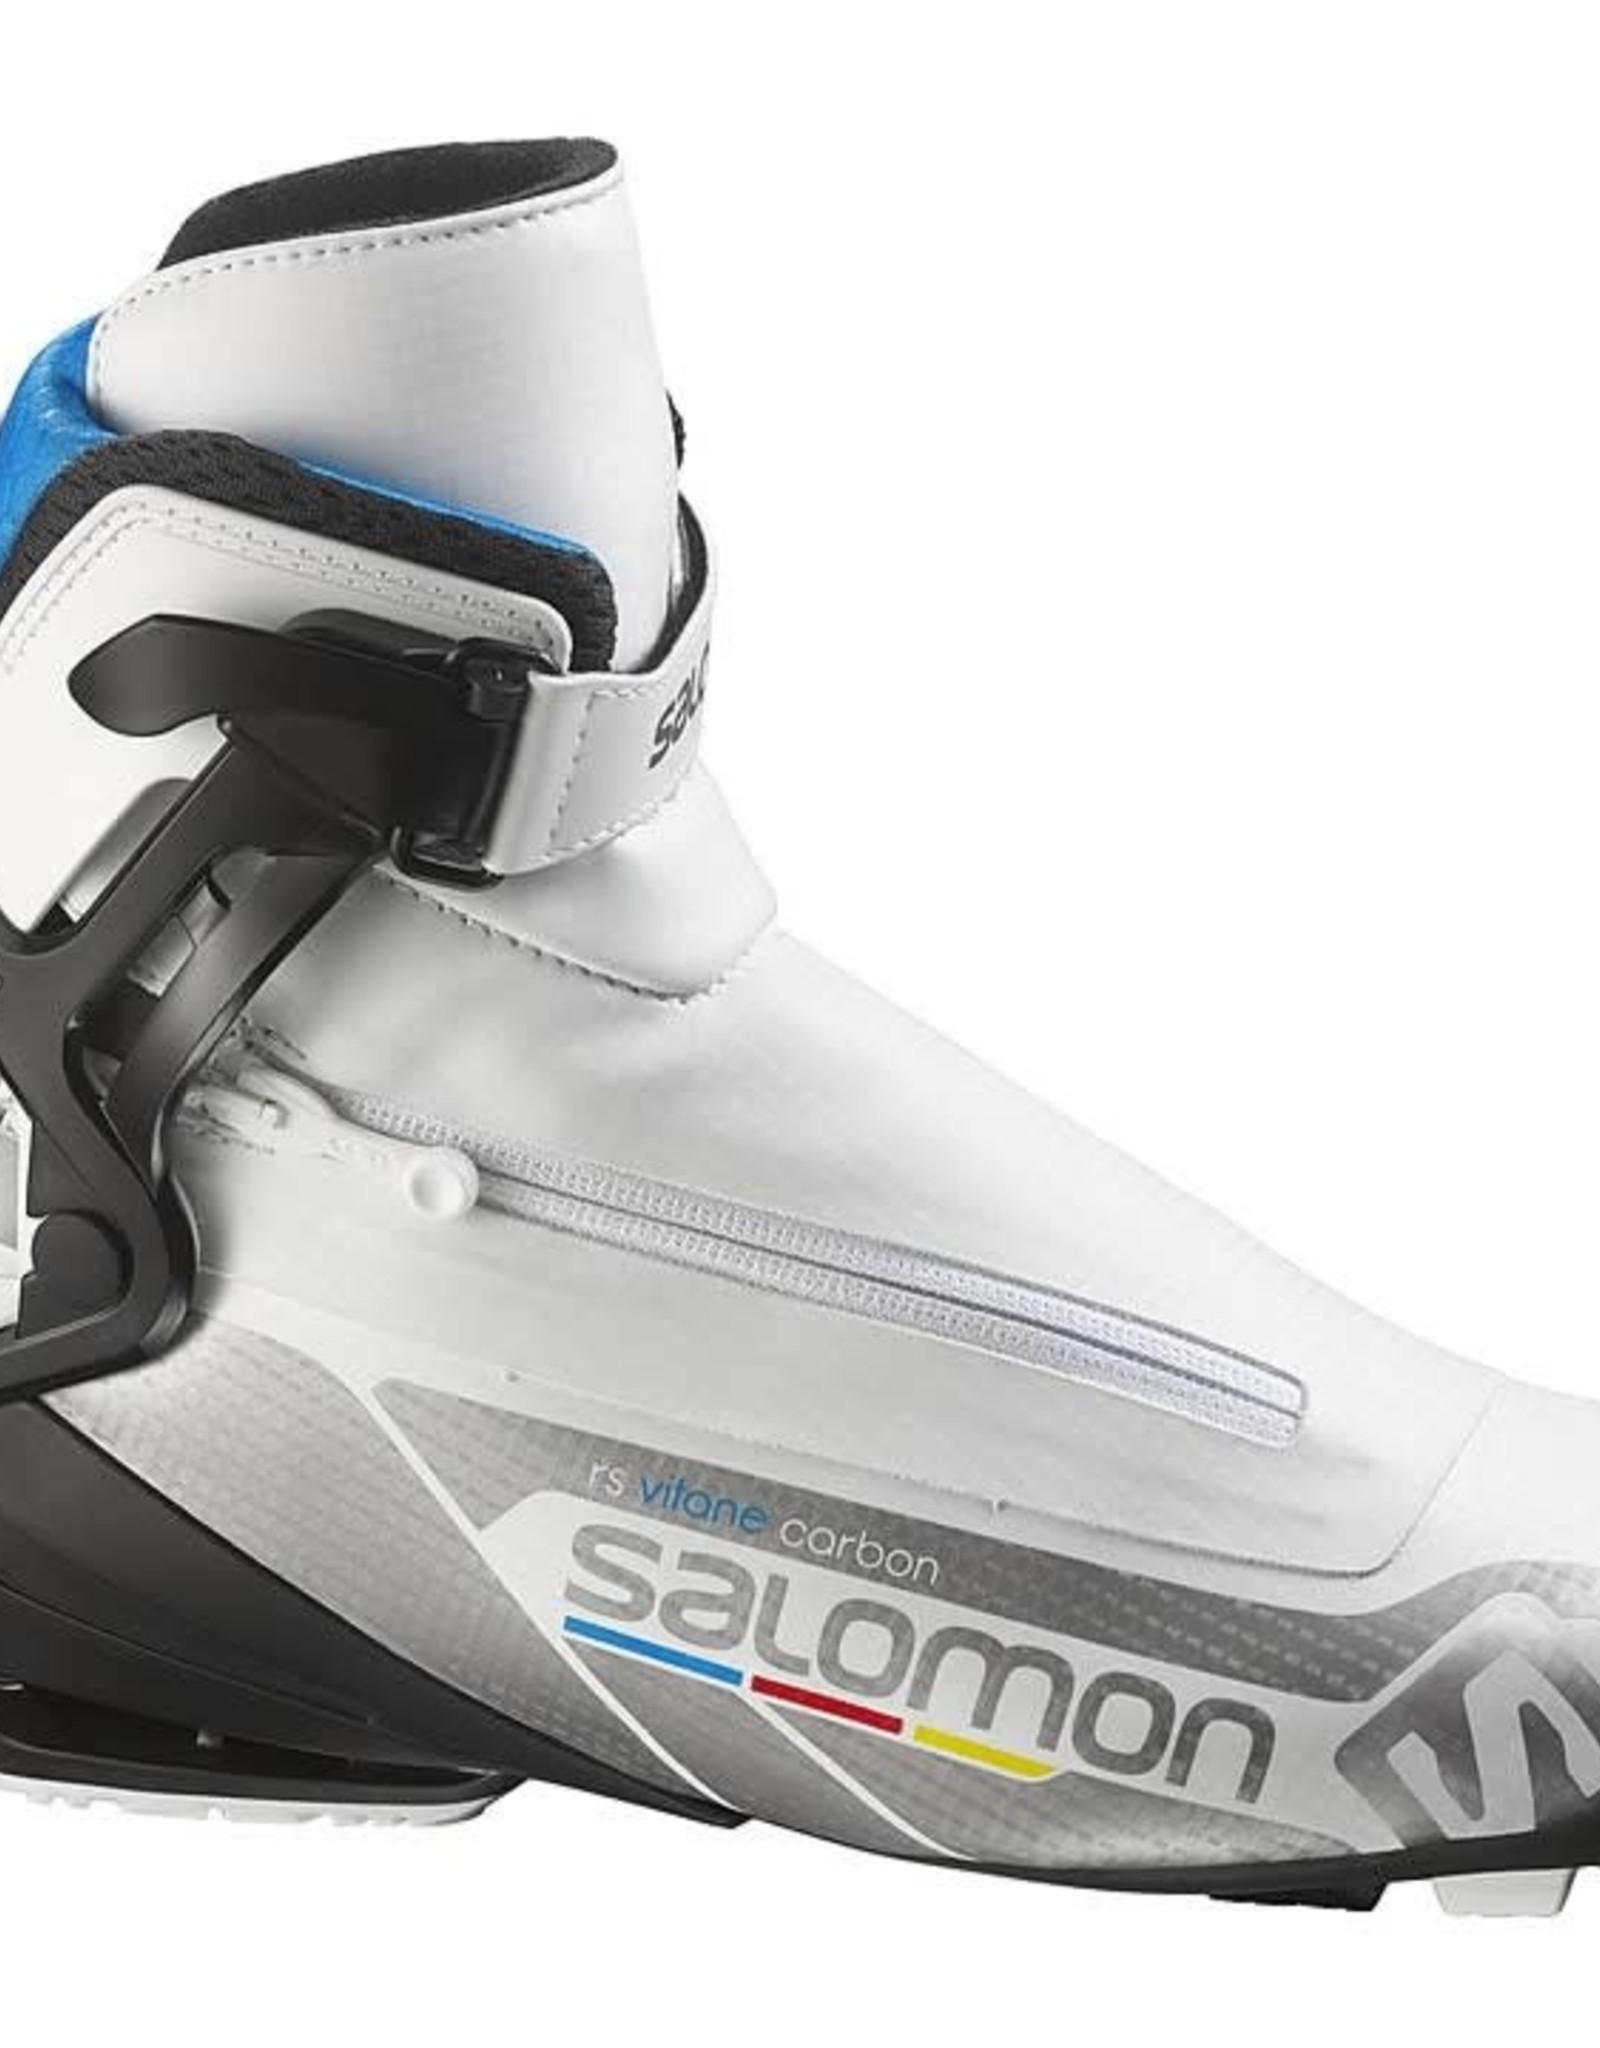 SALOMON SALOMON SNS Race Skate VITANE Carbon